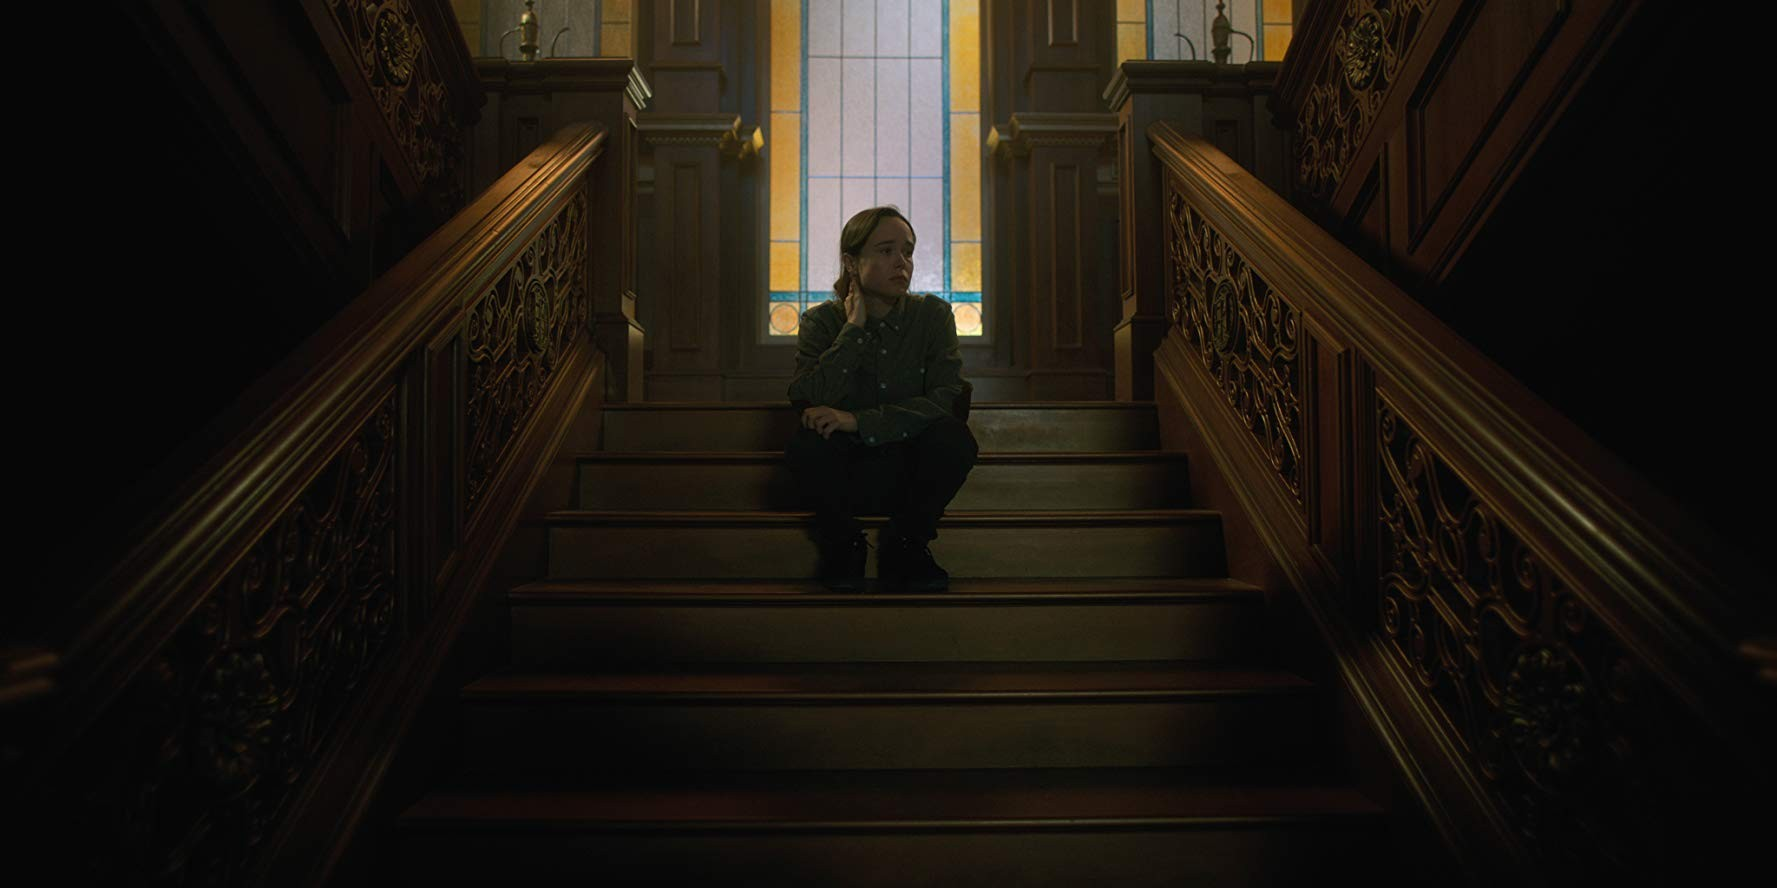 Ellen Page diz que é transgenero e muda nome para Elliot